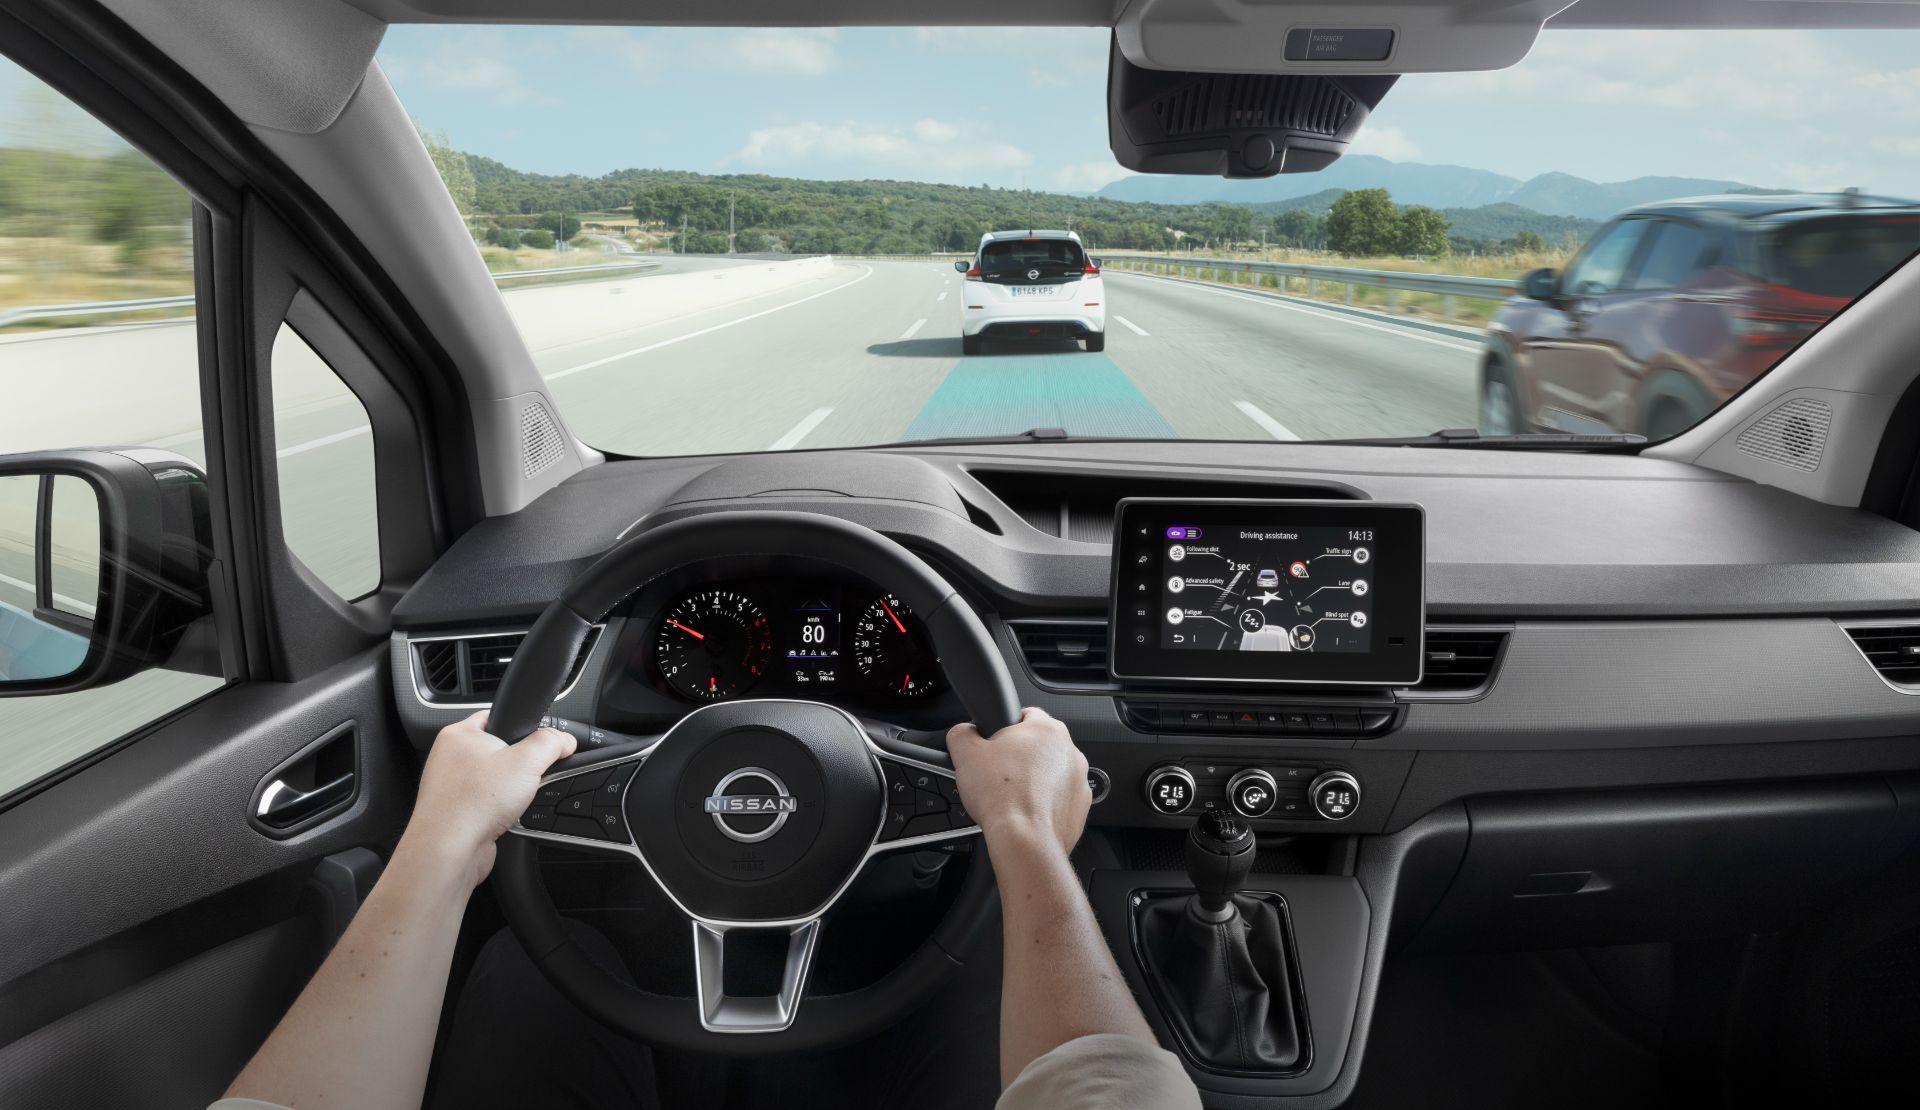 2022-Nissan-Townstar-petrol-van-dynamic-29